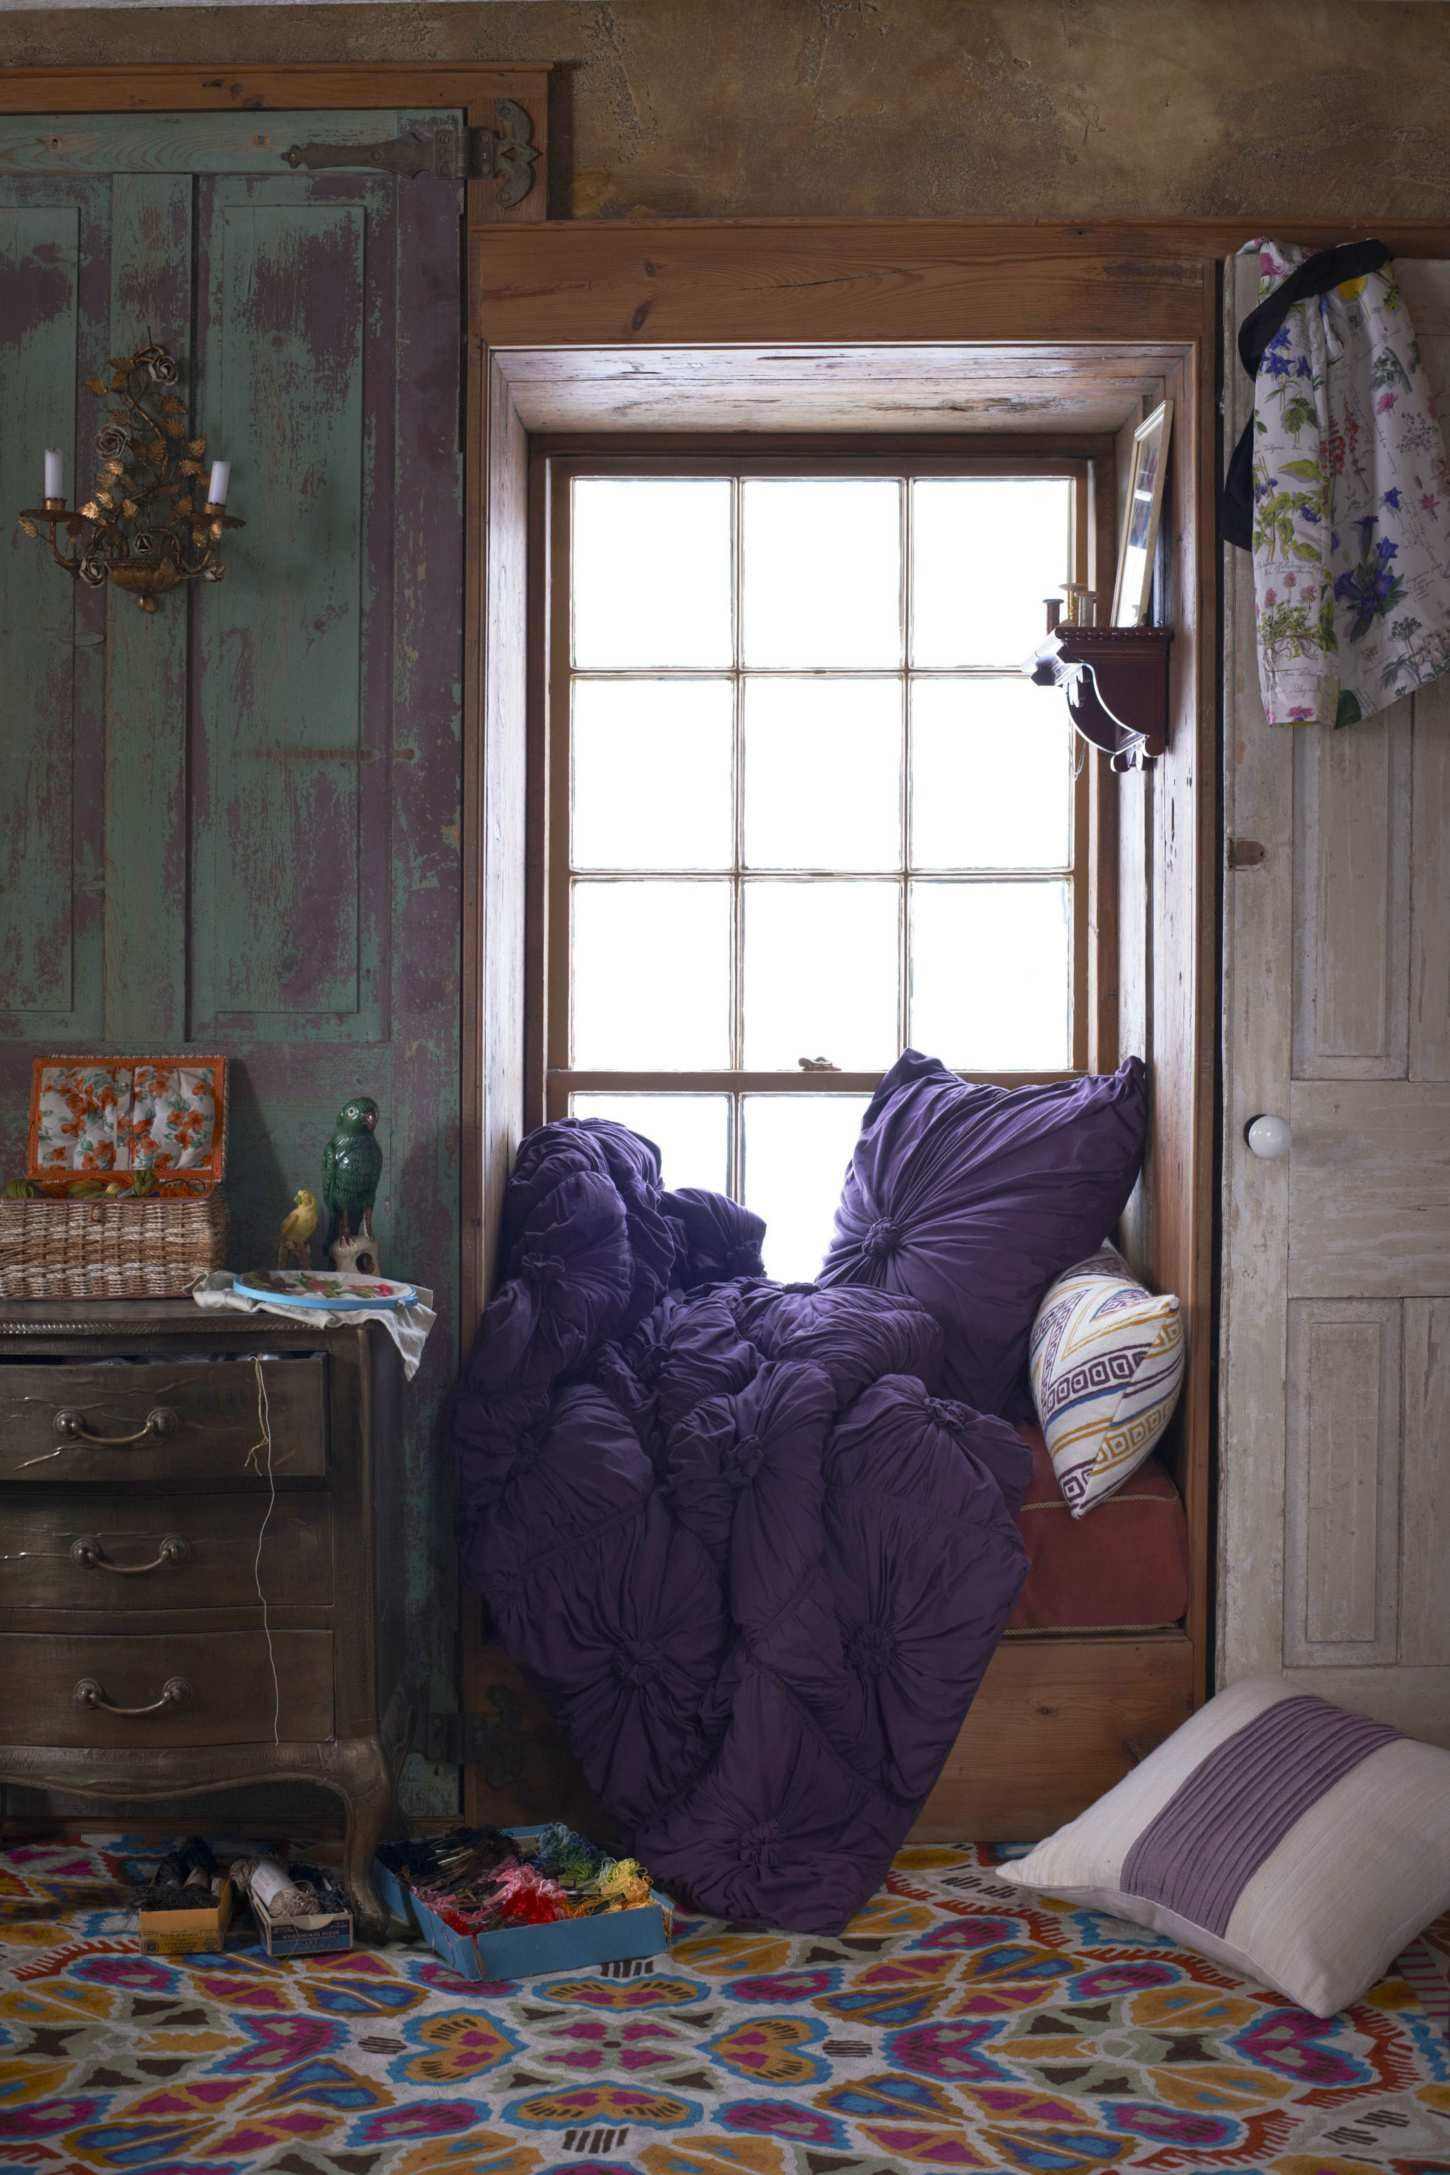 Window nook decorating ideas  reading nook  libros  pinterest  reading nooks window and cozy